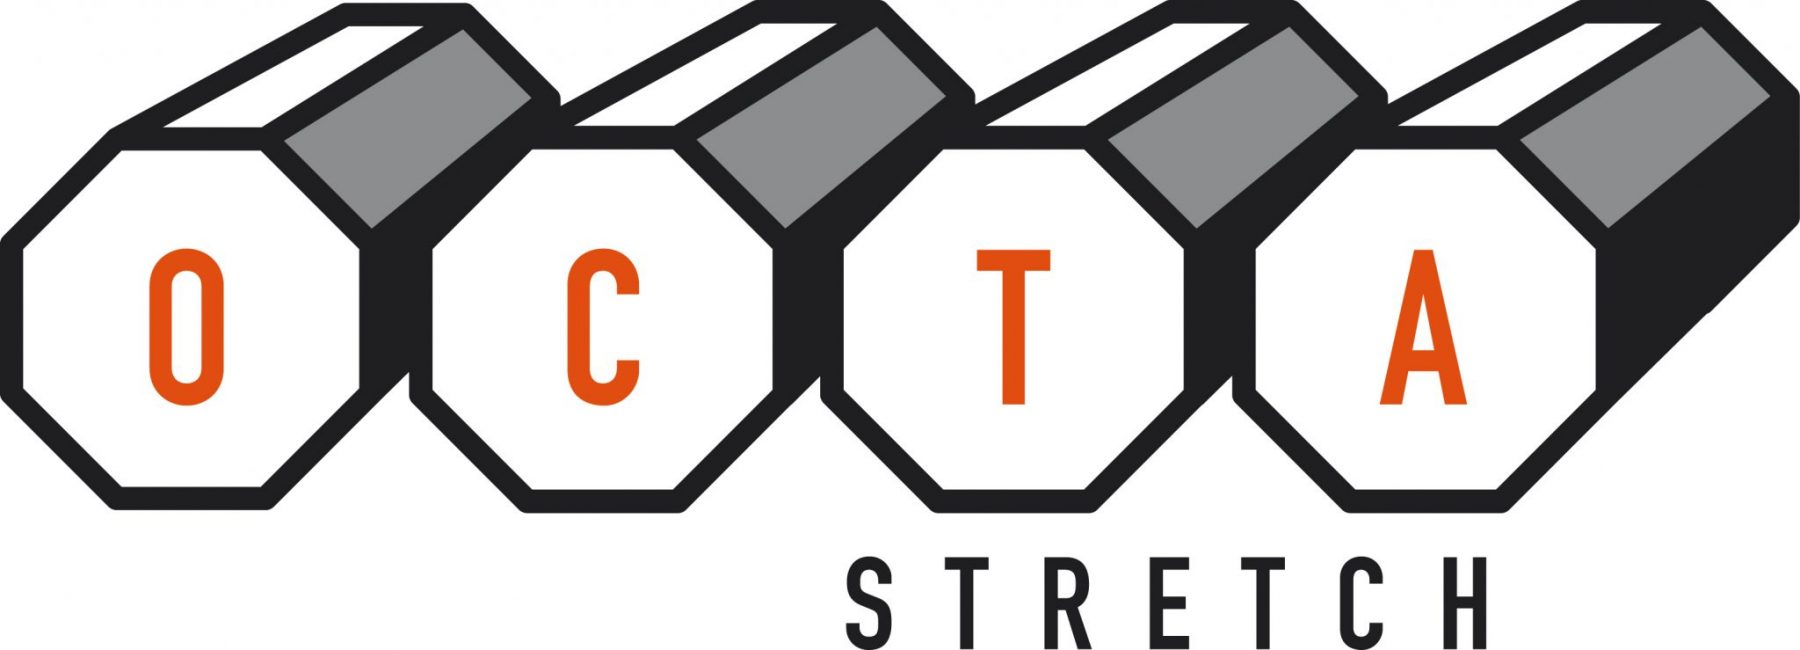 Octa Stretch